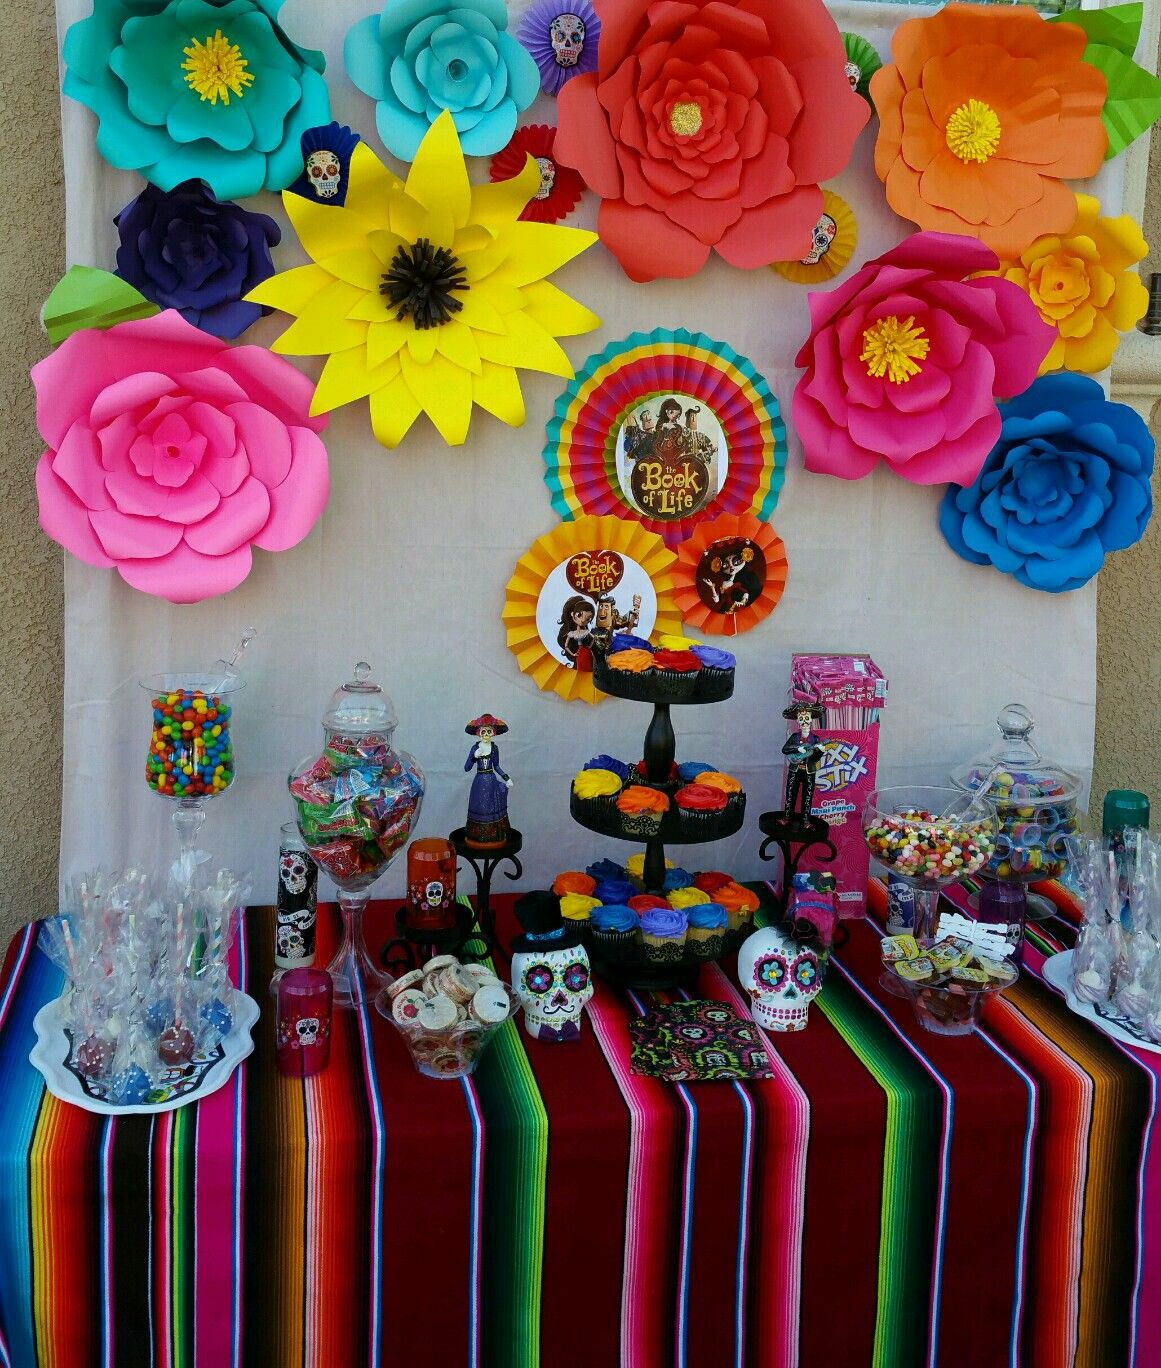 Book of life birthday Mexican party theme, Dia de los